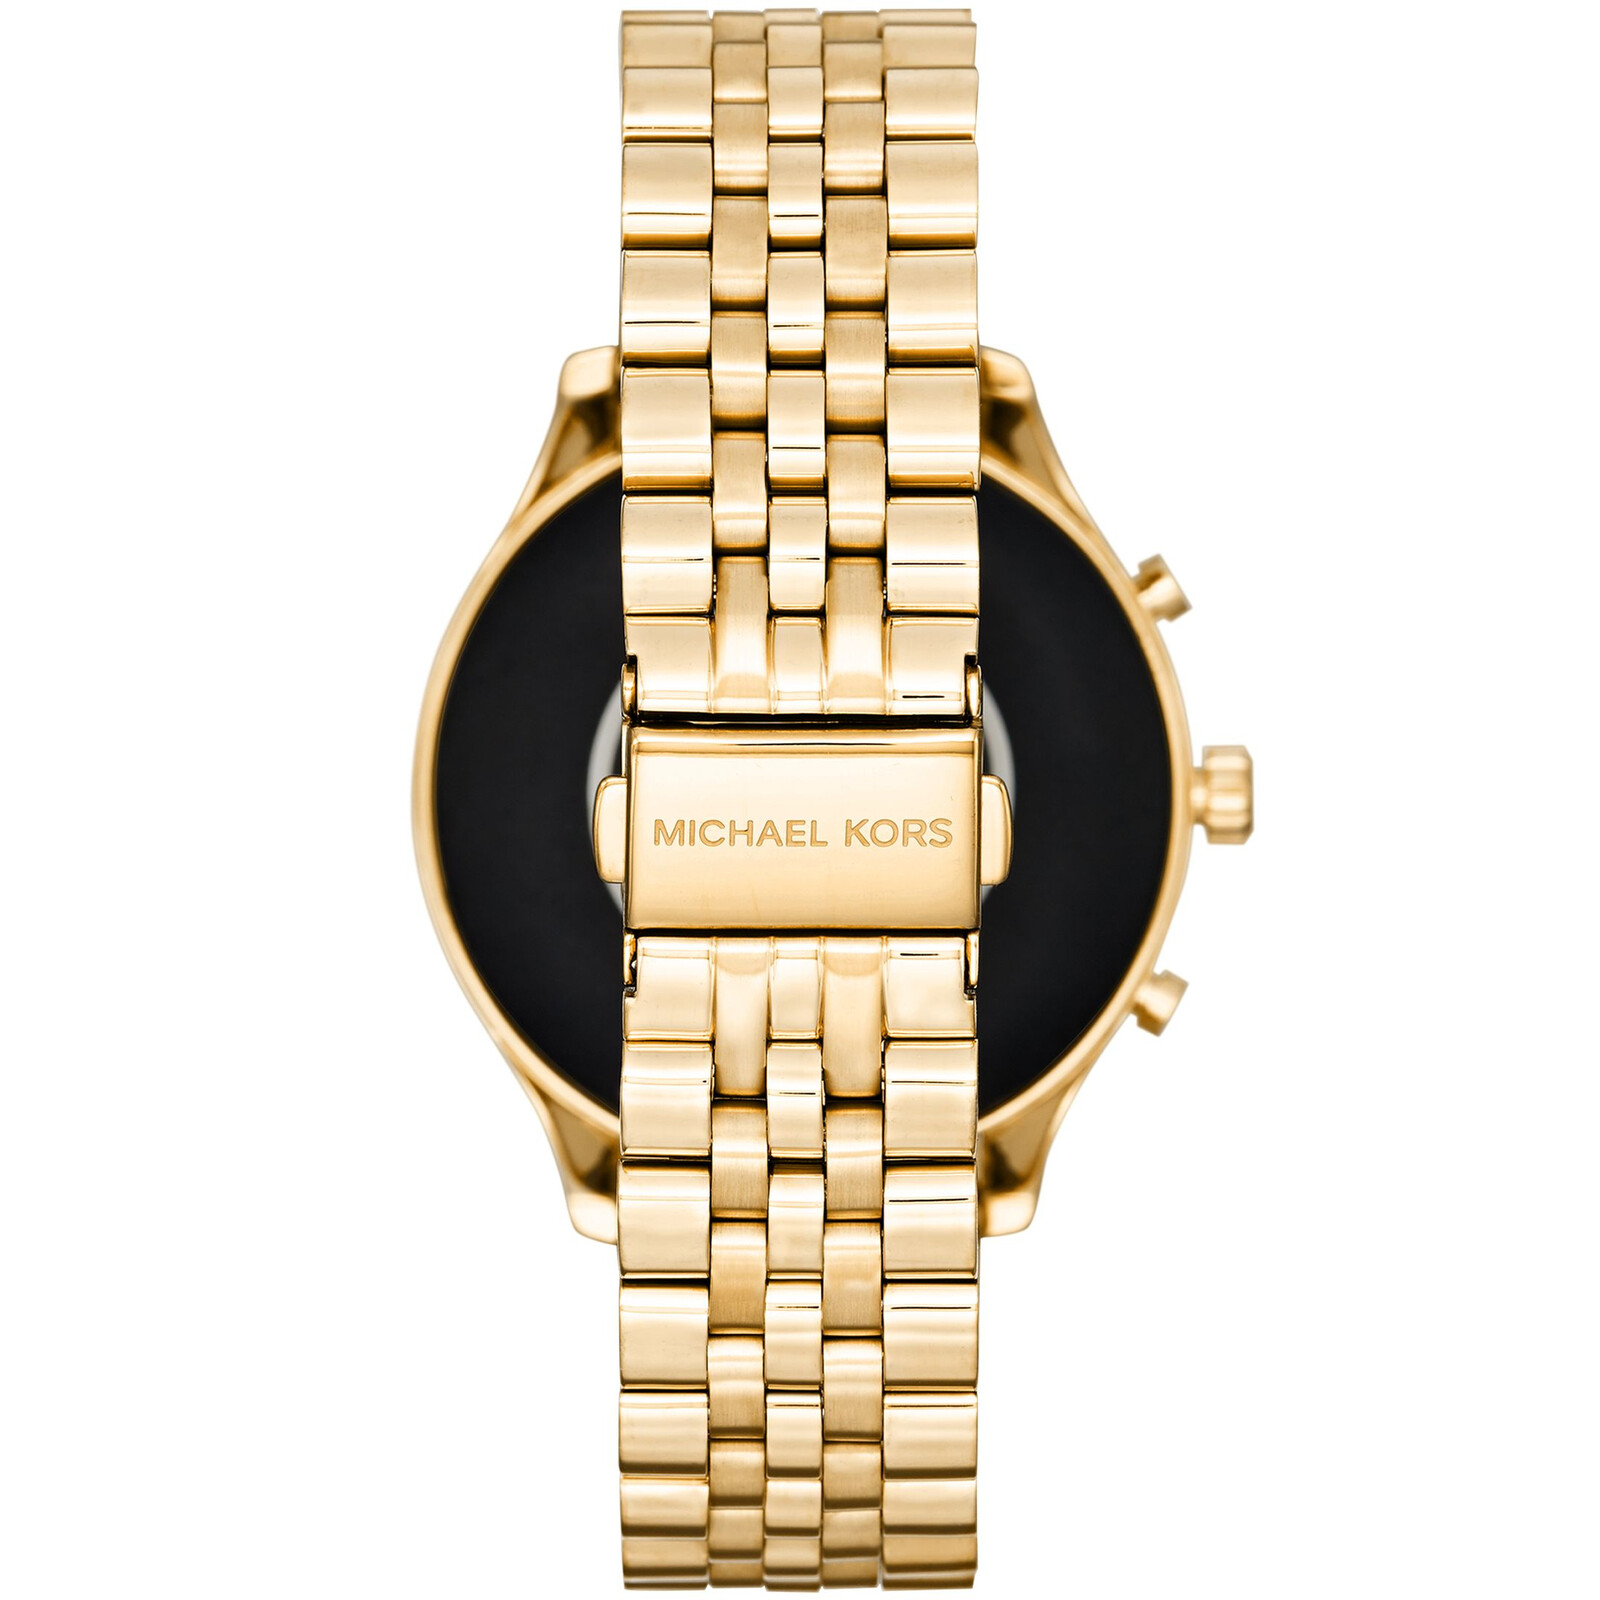 Michael Kors Smartwatch Lexington 2 gold